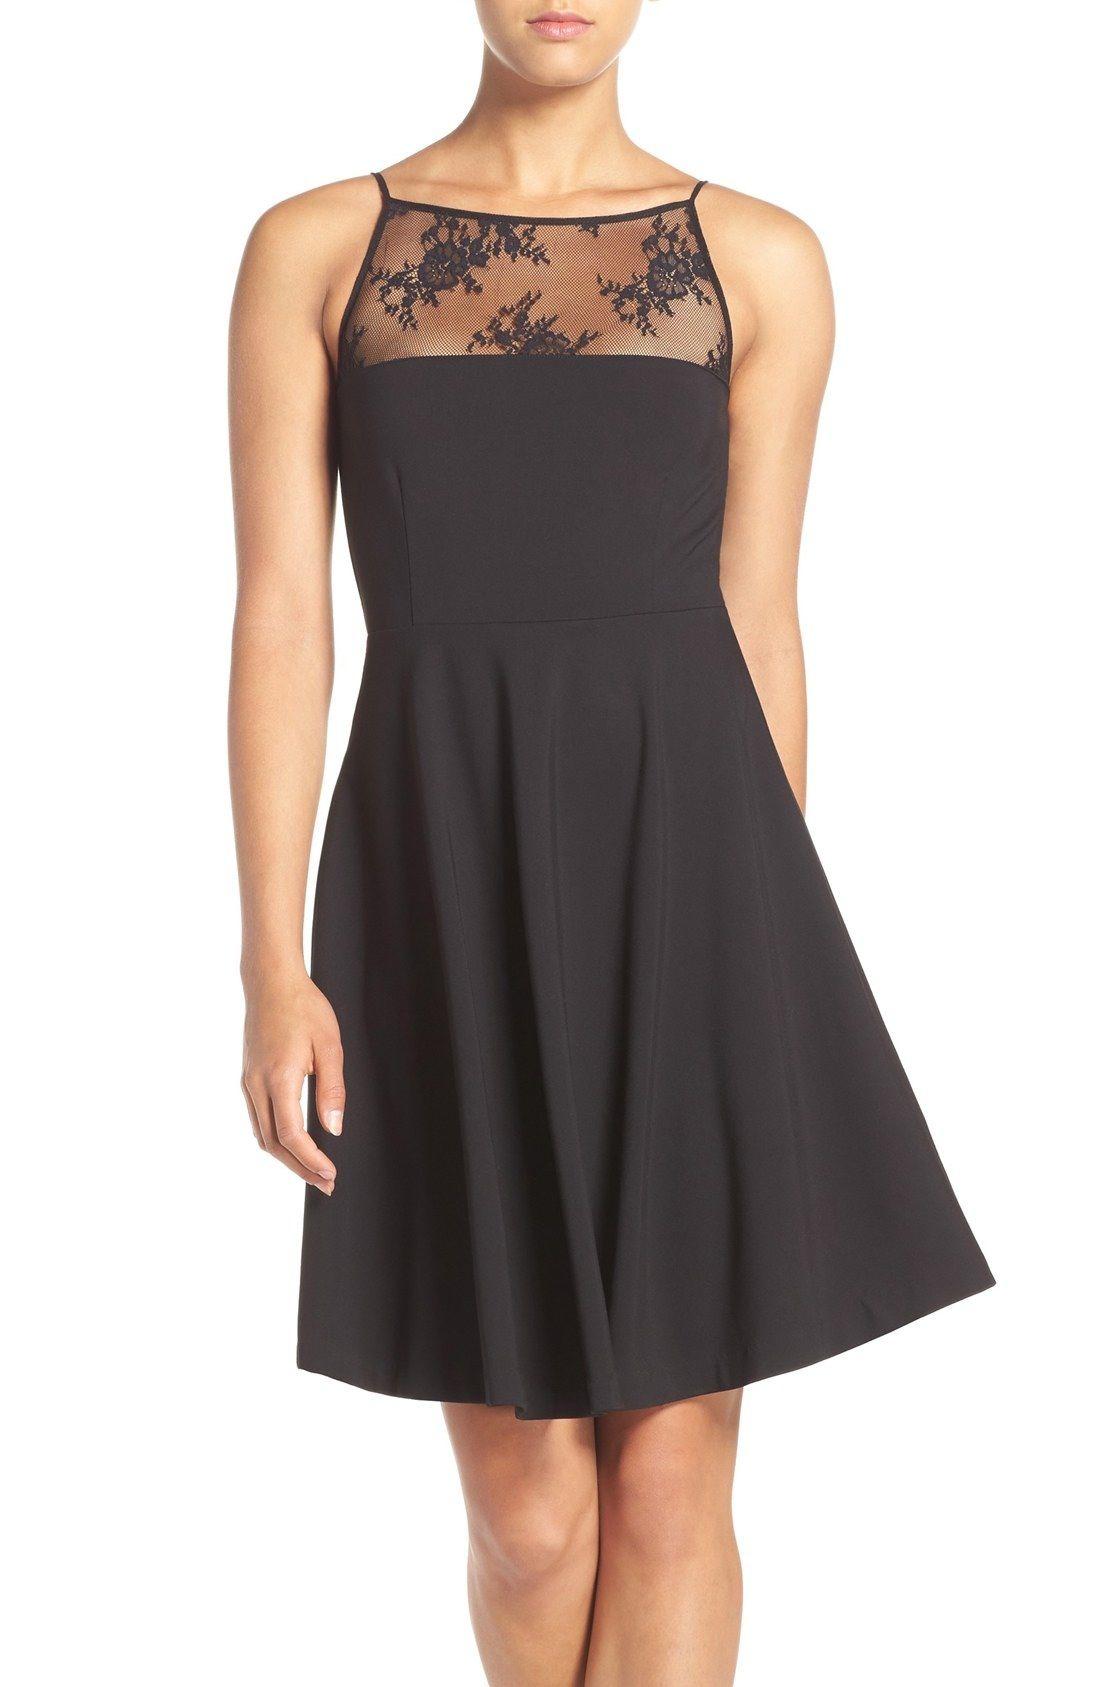 Bb dakota milford lace ponte fit flare dress